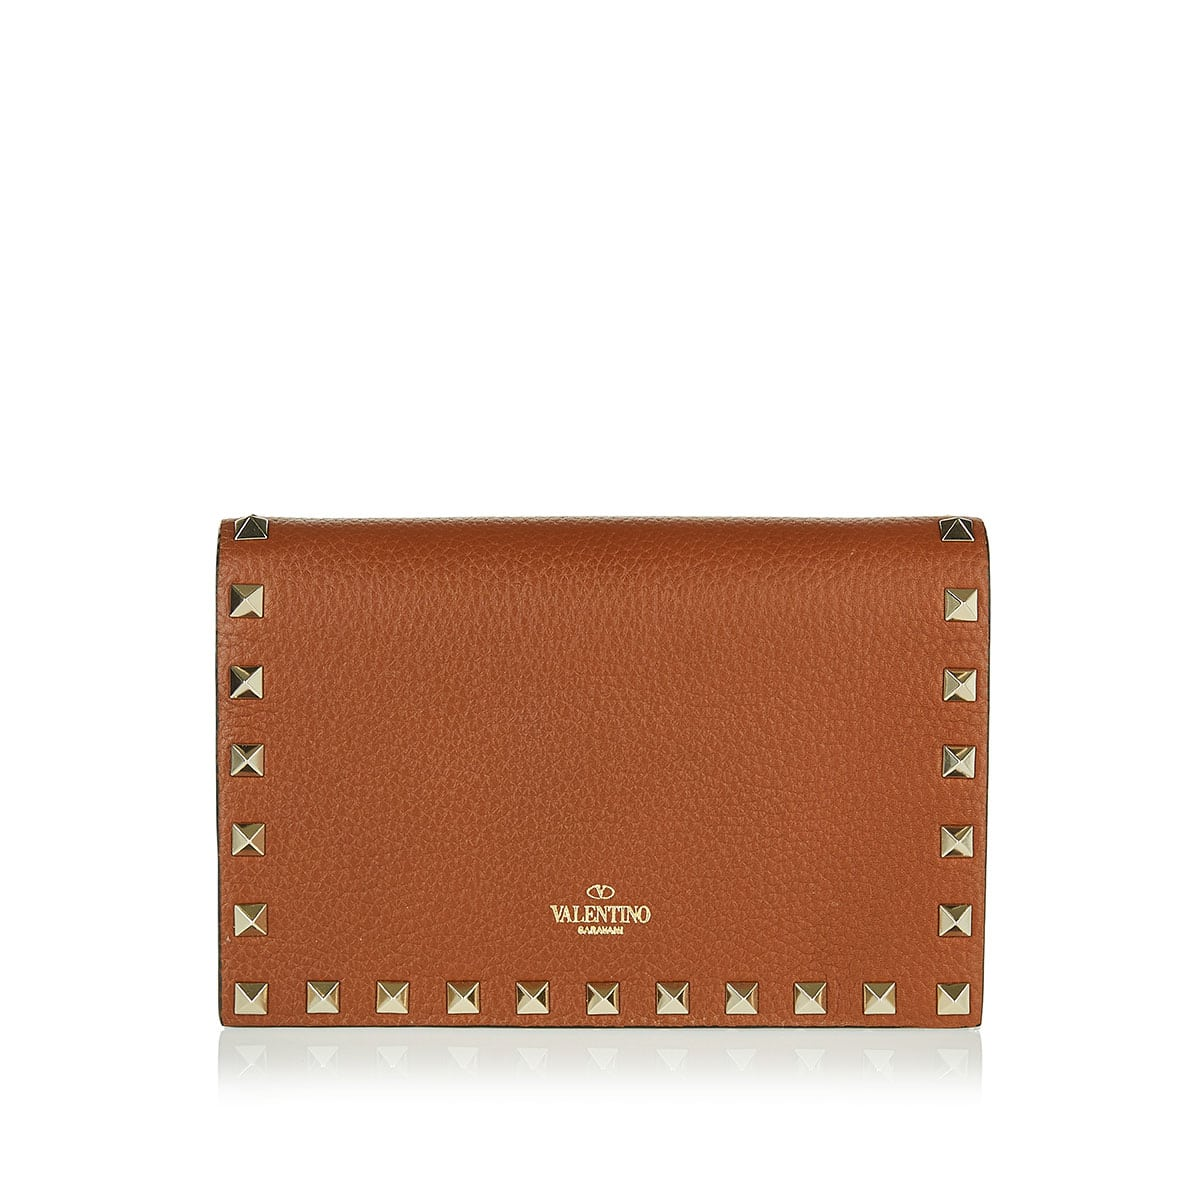 Rockstud leather chain bag